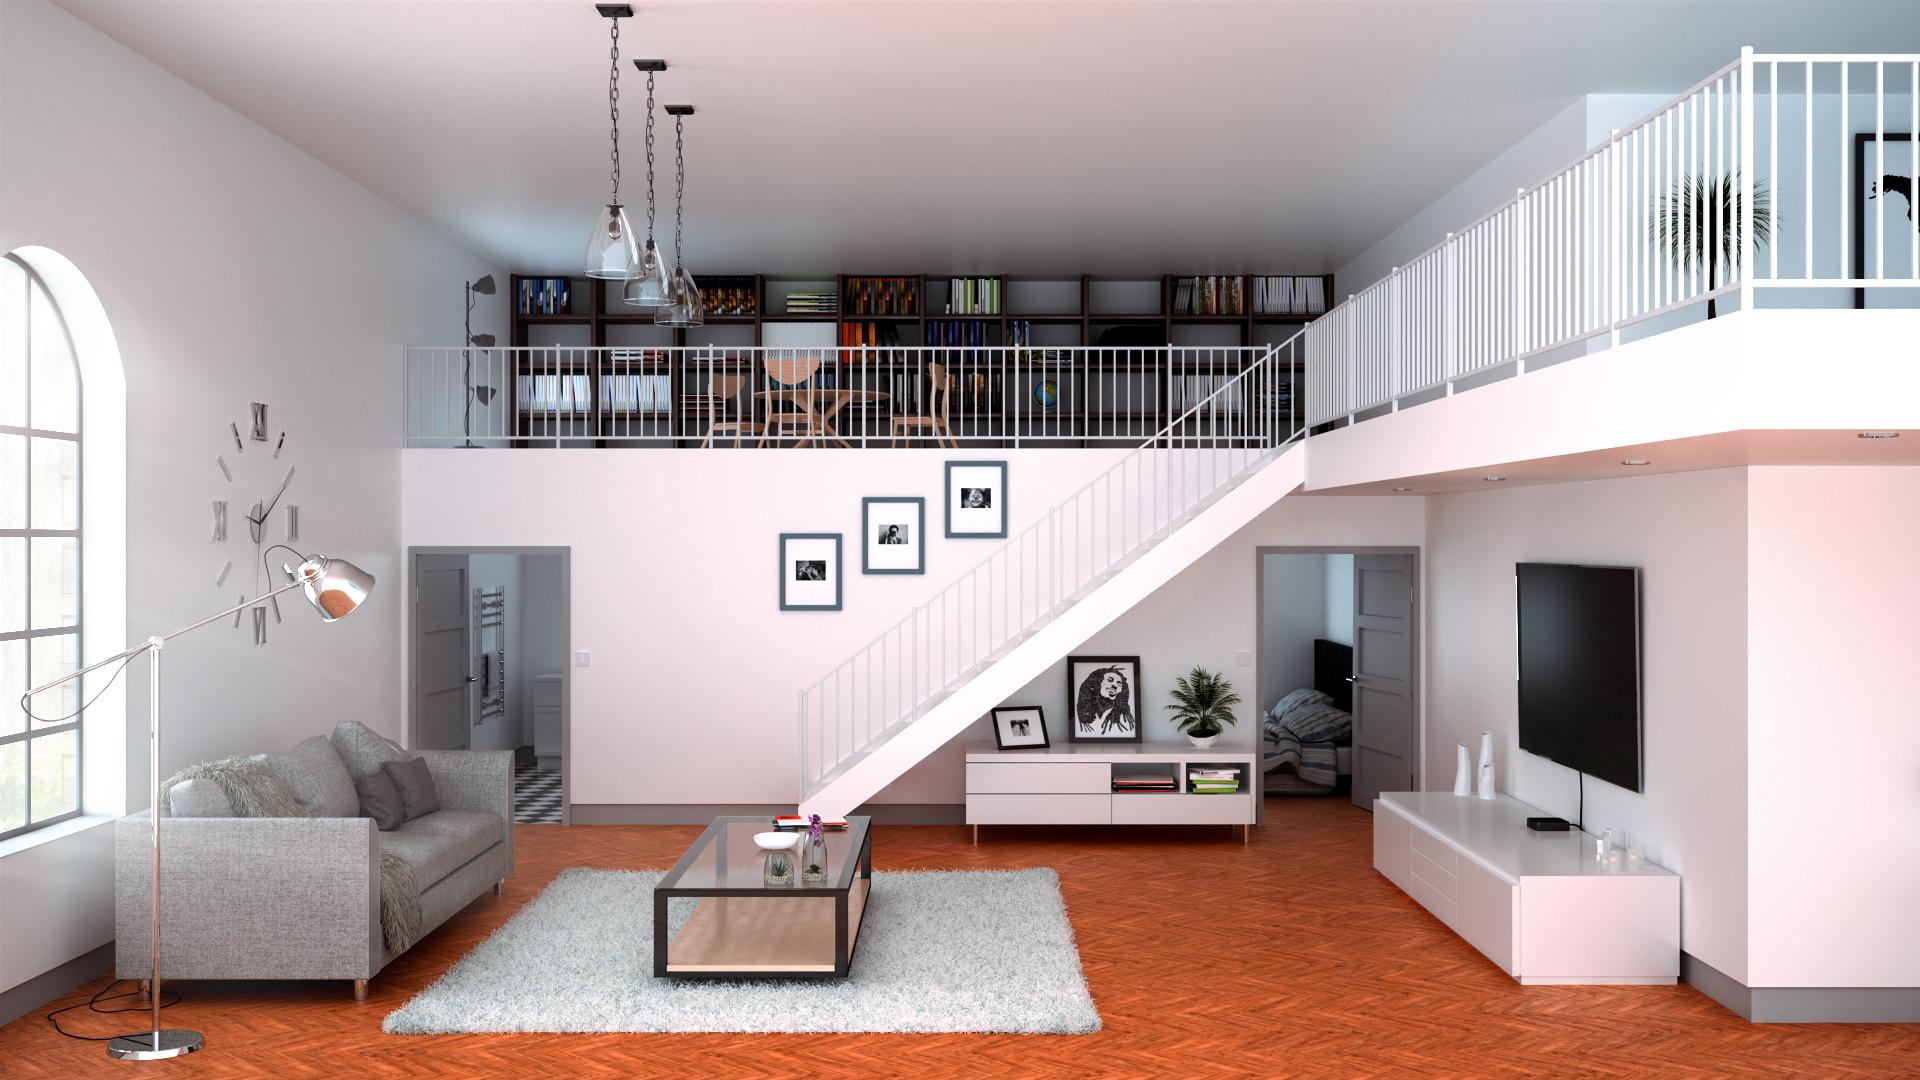 High Ceiling Apartment